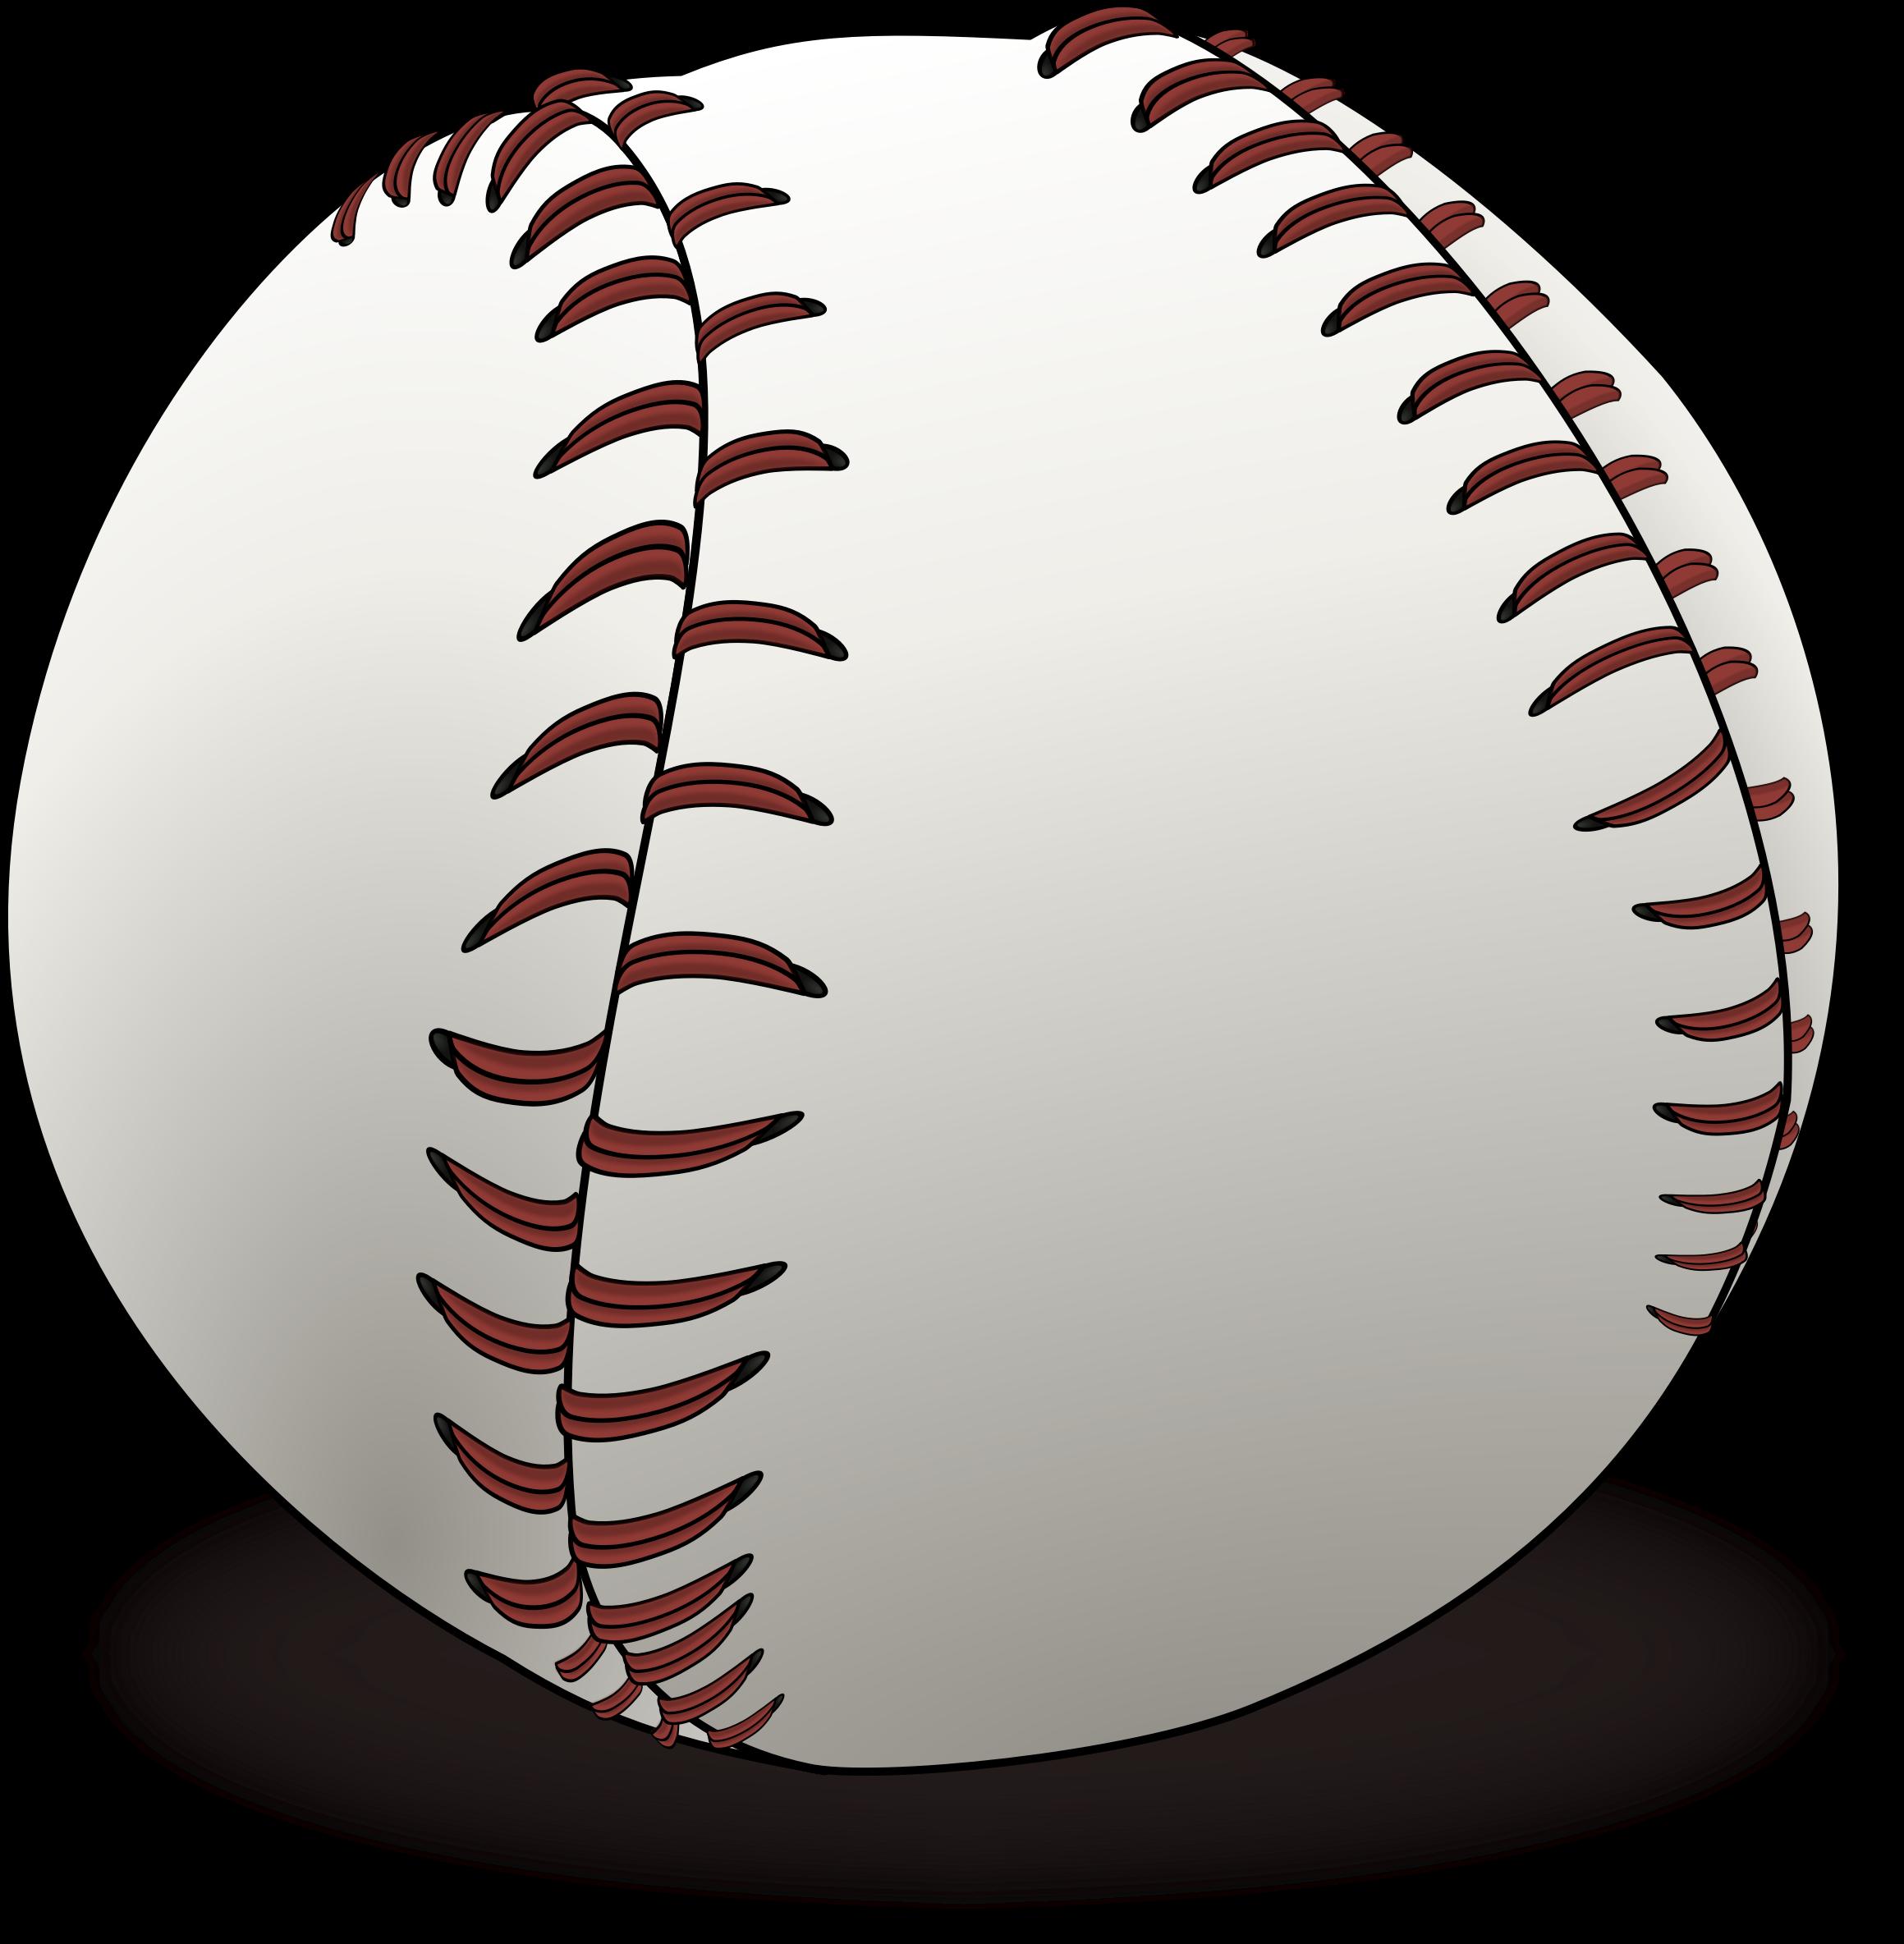 Big image png. Baseball round clipart